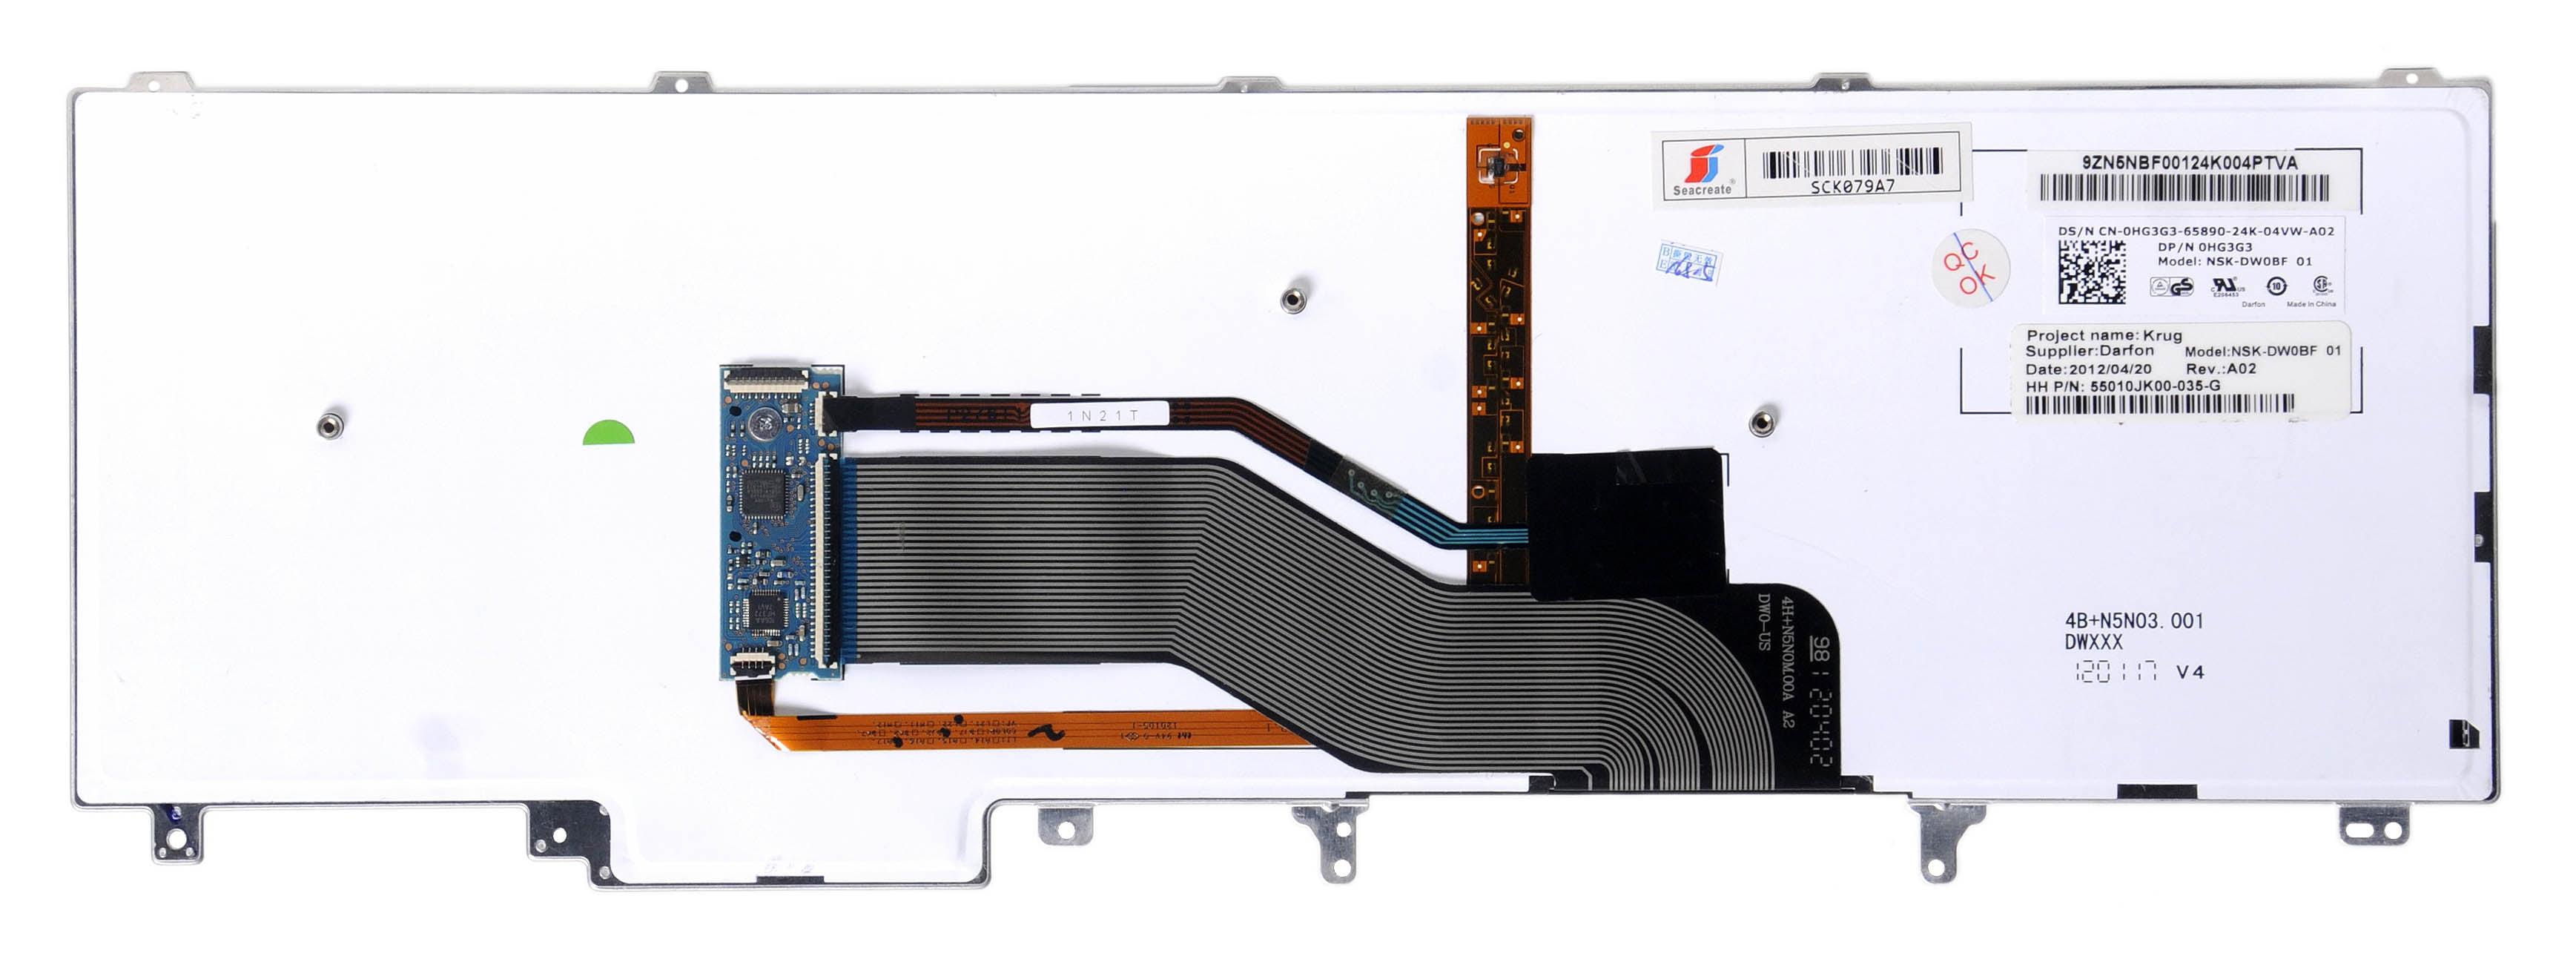 New Original Dell Precision M4600 M4700 M4800 US Keyboard Backlit Pointer